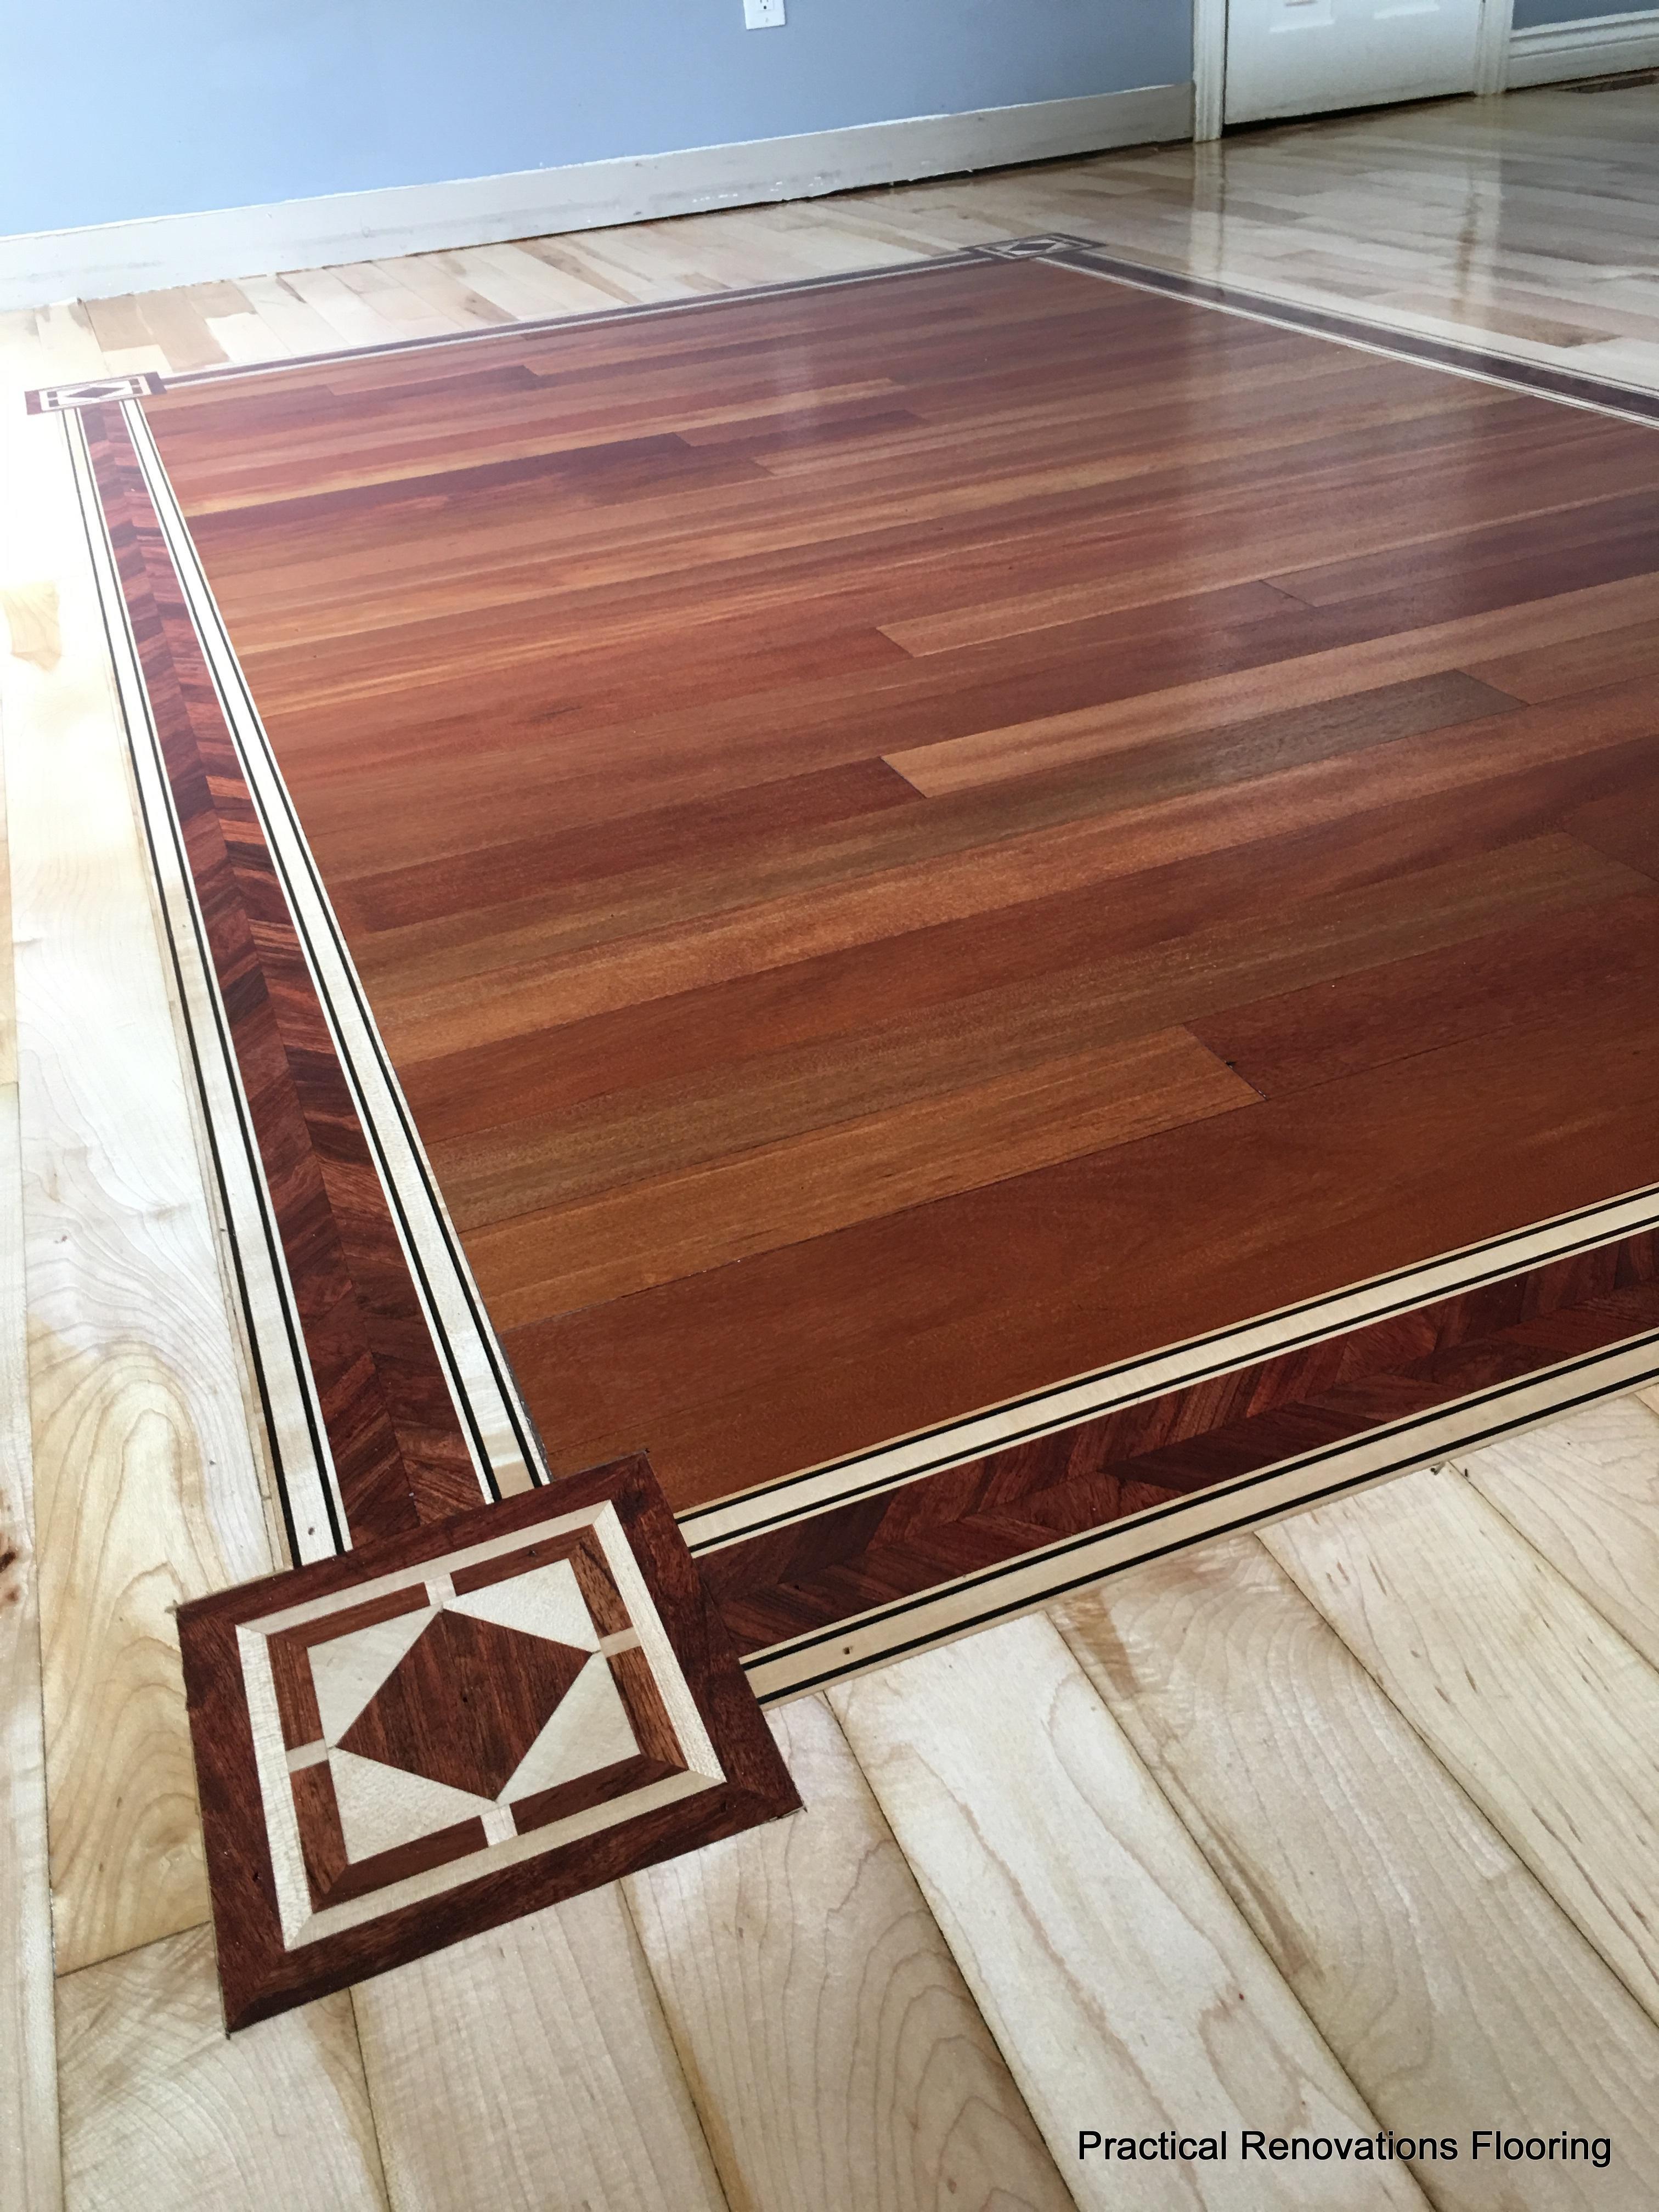 Practical Renovations Wood floors image 5